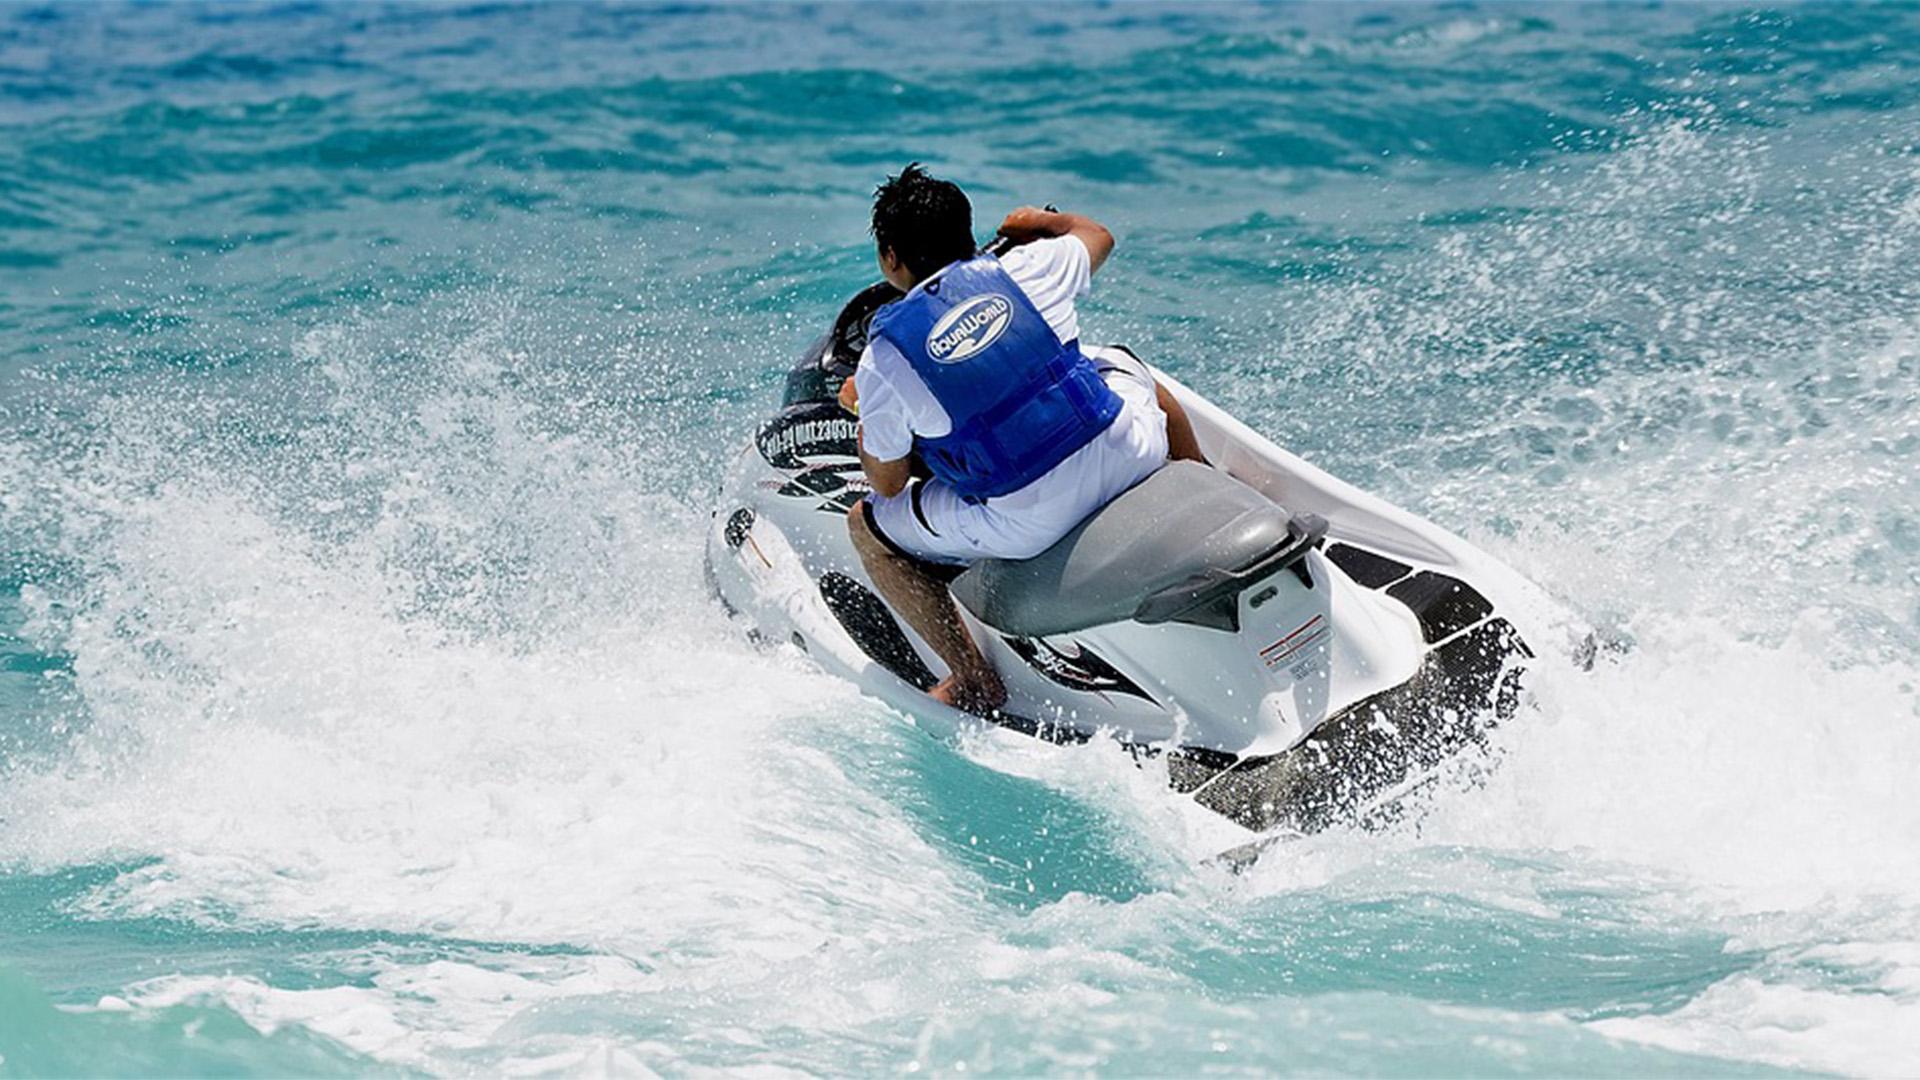 Aktivitäten Funsport Jetski Fuerteventura.